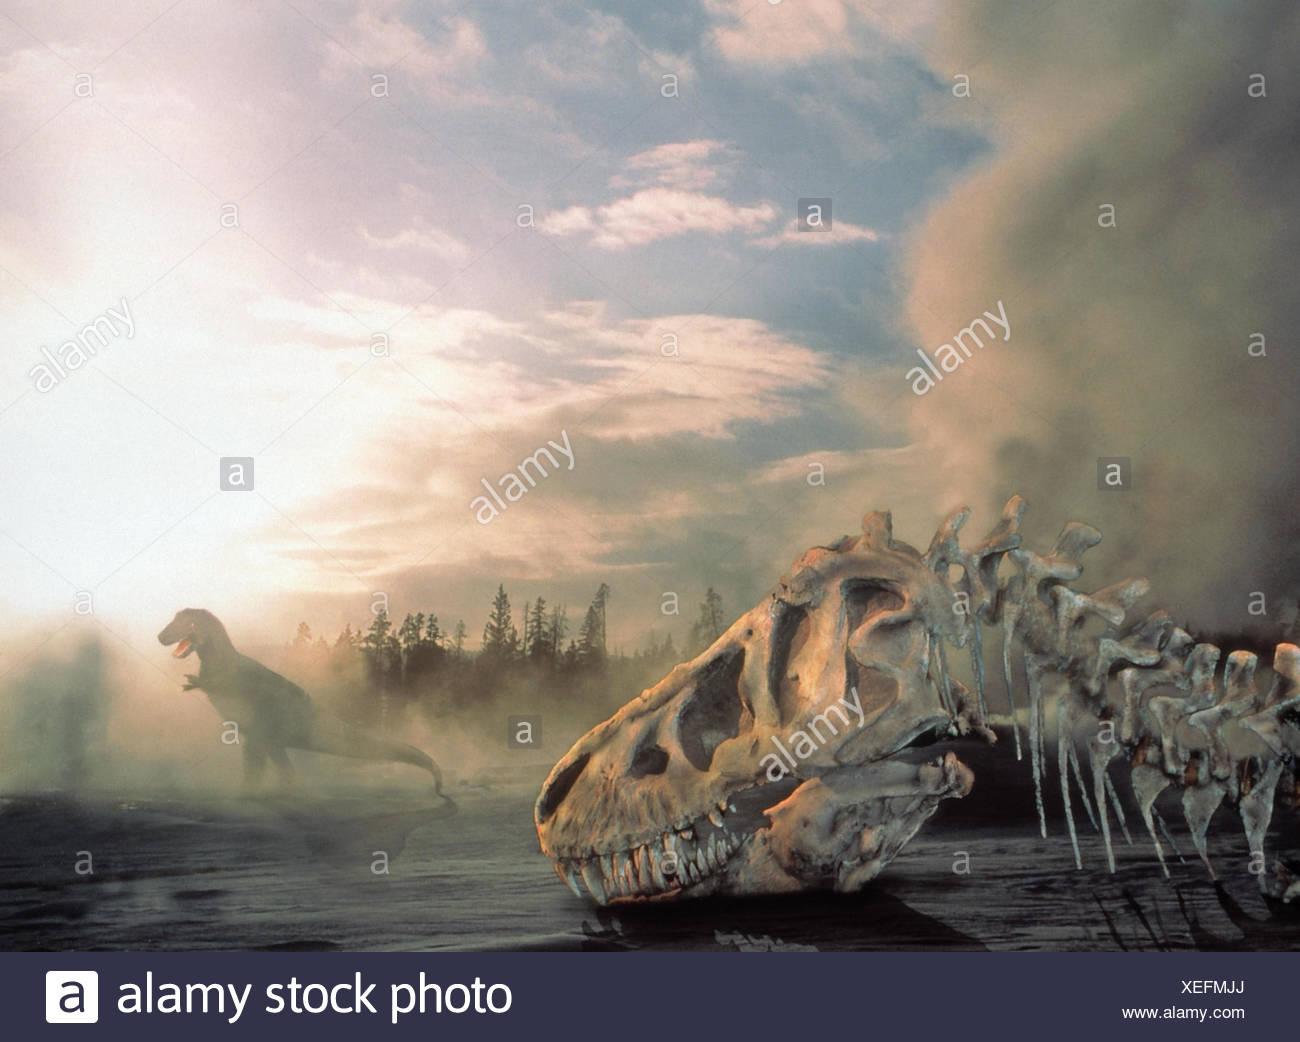 Scenery, simulations, dinosaurs, dinosaur skeleton, fog primeval times, primordial animals, prehistorically, wood, old animal, extinct, predator, past - Stock Image